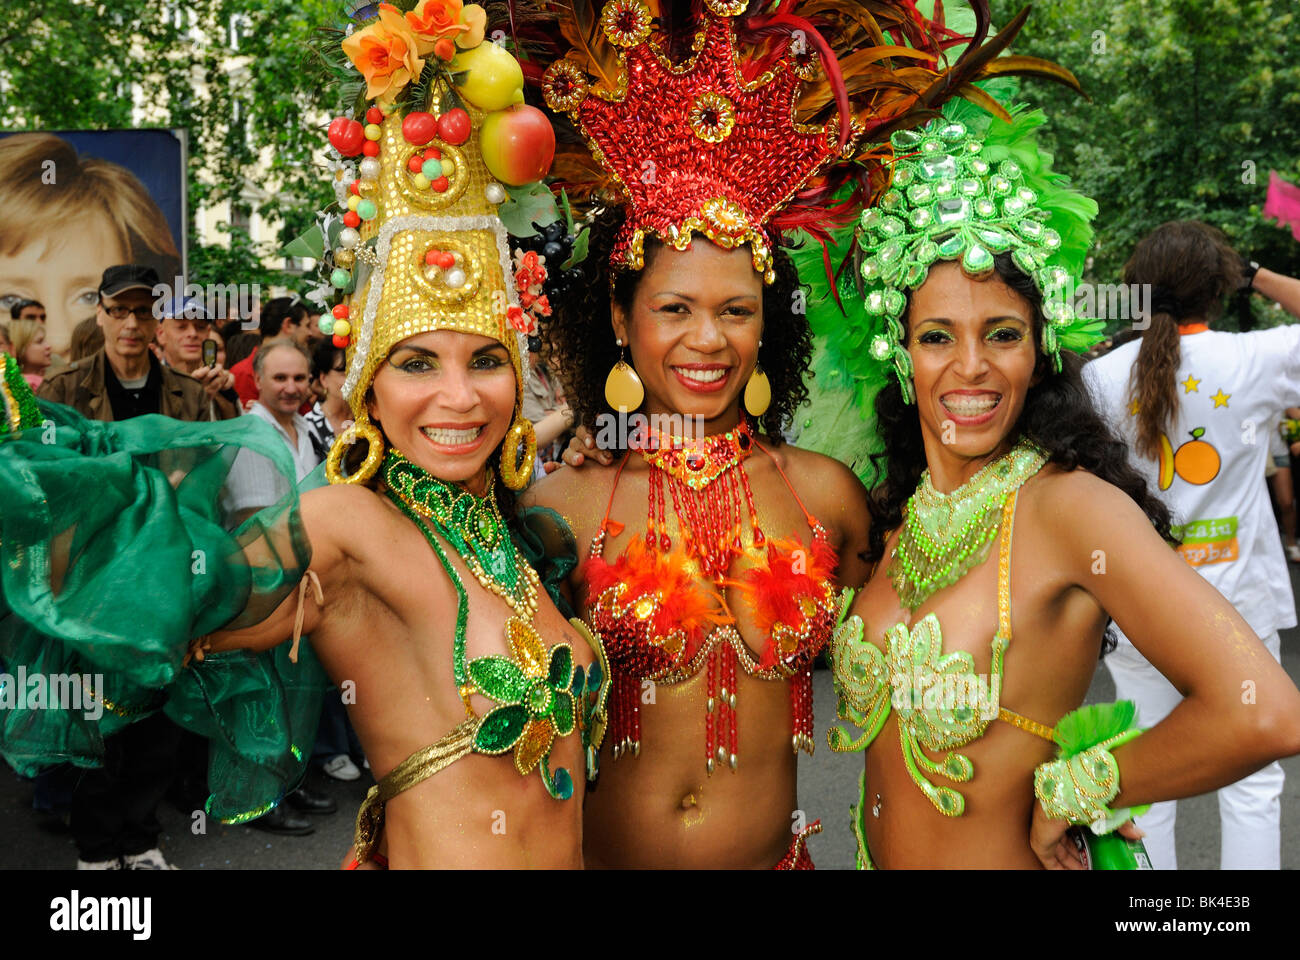 Tre brasiliano ballerini di Samba a Karneval der Kulturen, Carnevale di culture, quartiere Kreuzberg di Berlino, Immagini Stock